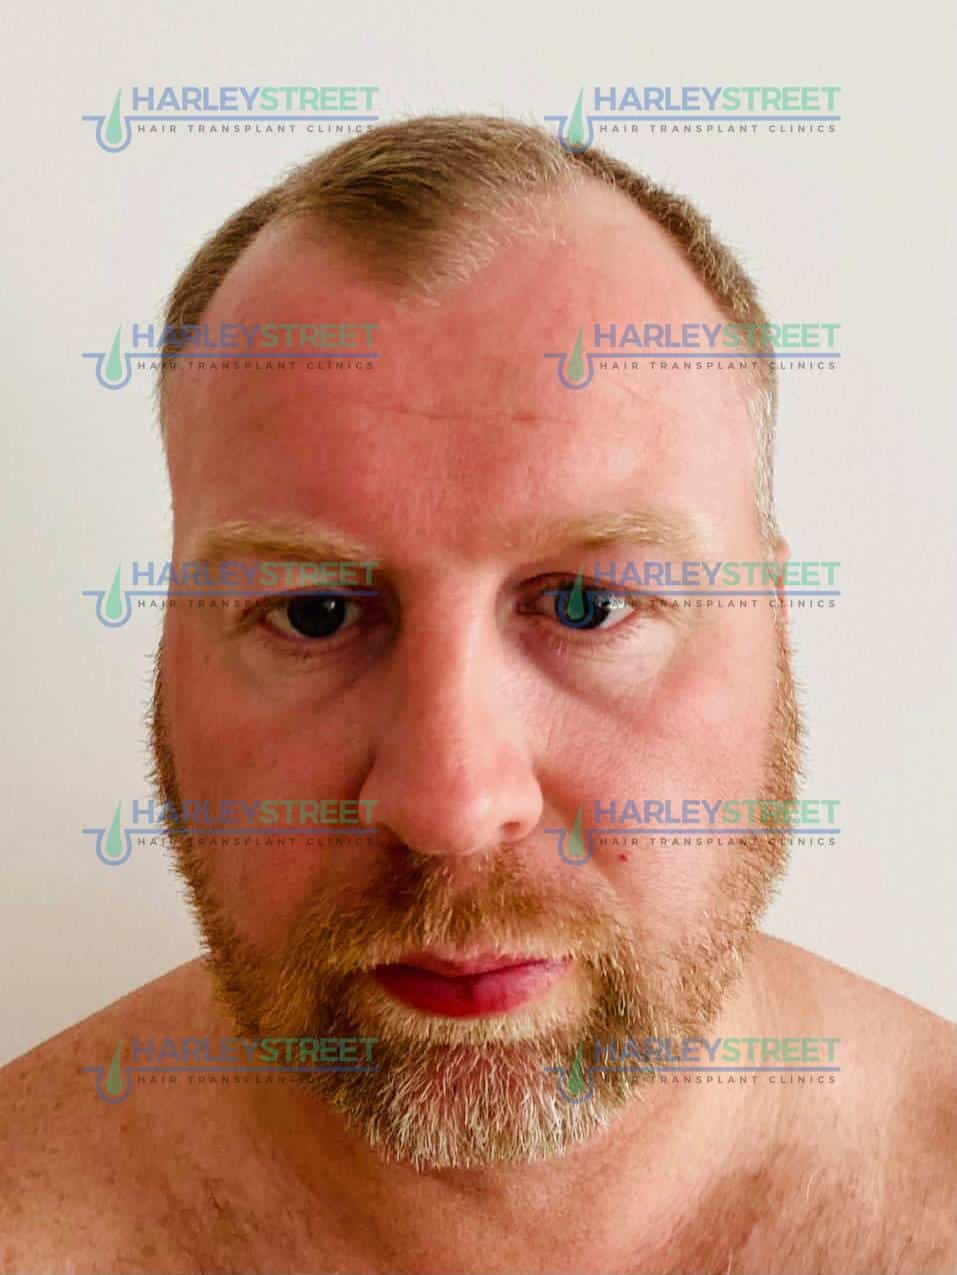 HarleyStreet Hair Transplant Clinic London Client before (1)